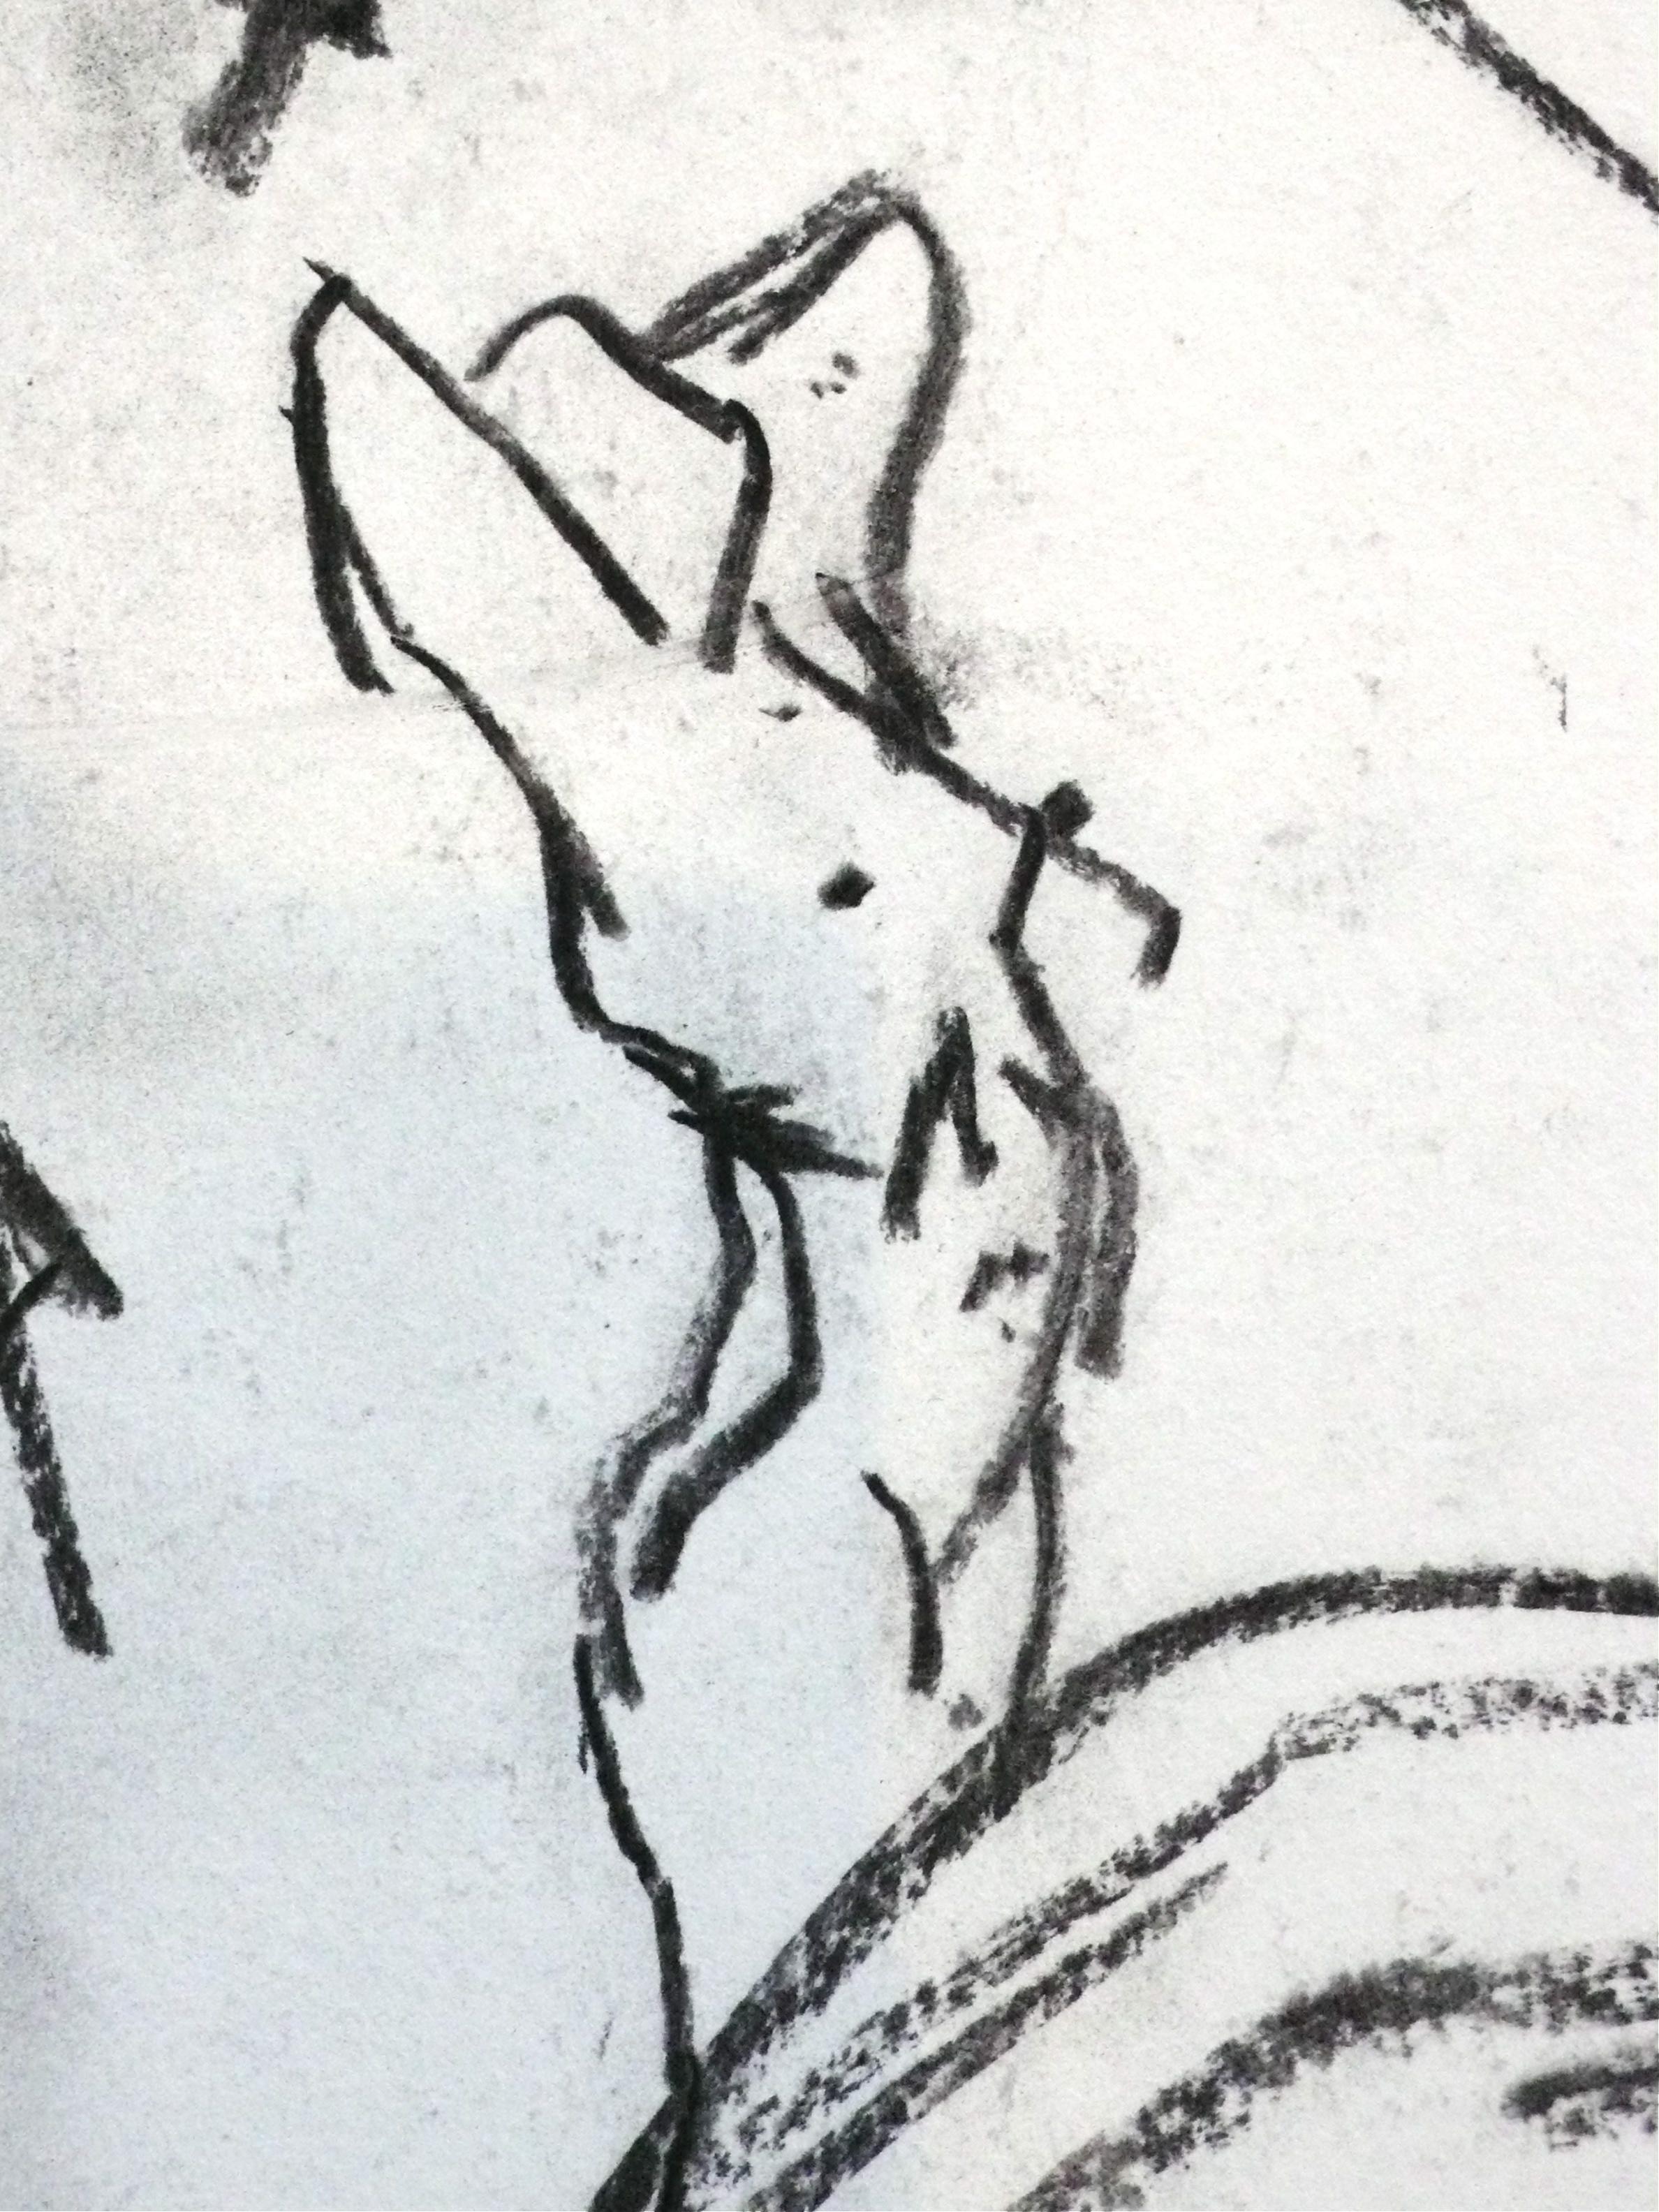 29-june-one-minute-sketch_2756769040_o.jpg